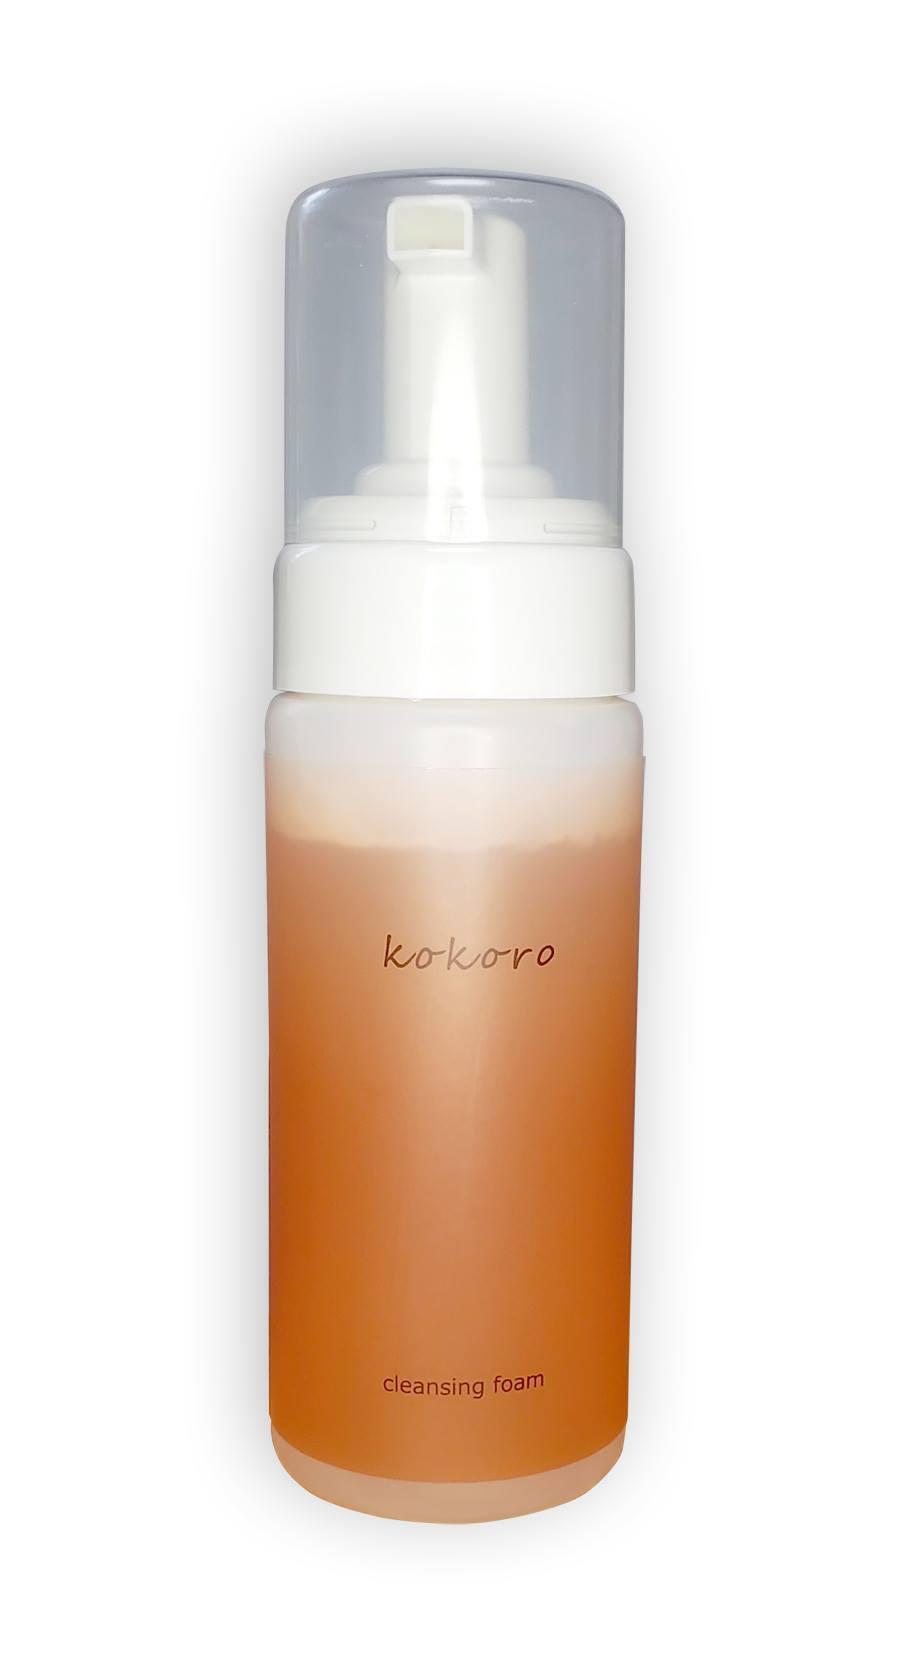 kokoro基礎化粧品シリーズ KOKOROクレンジングフォーム